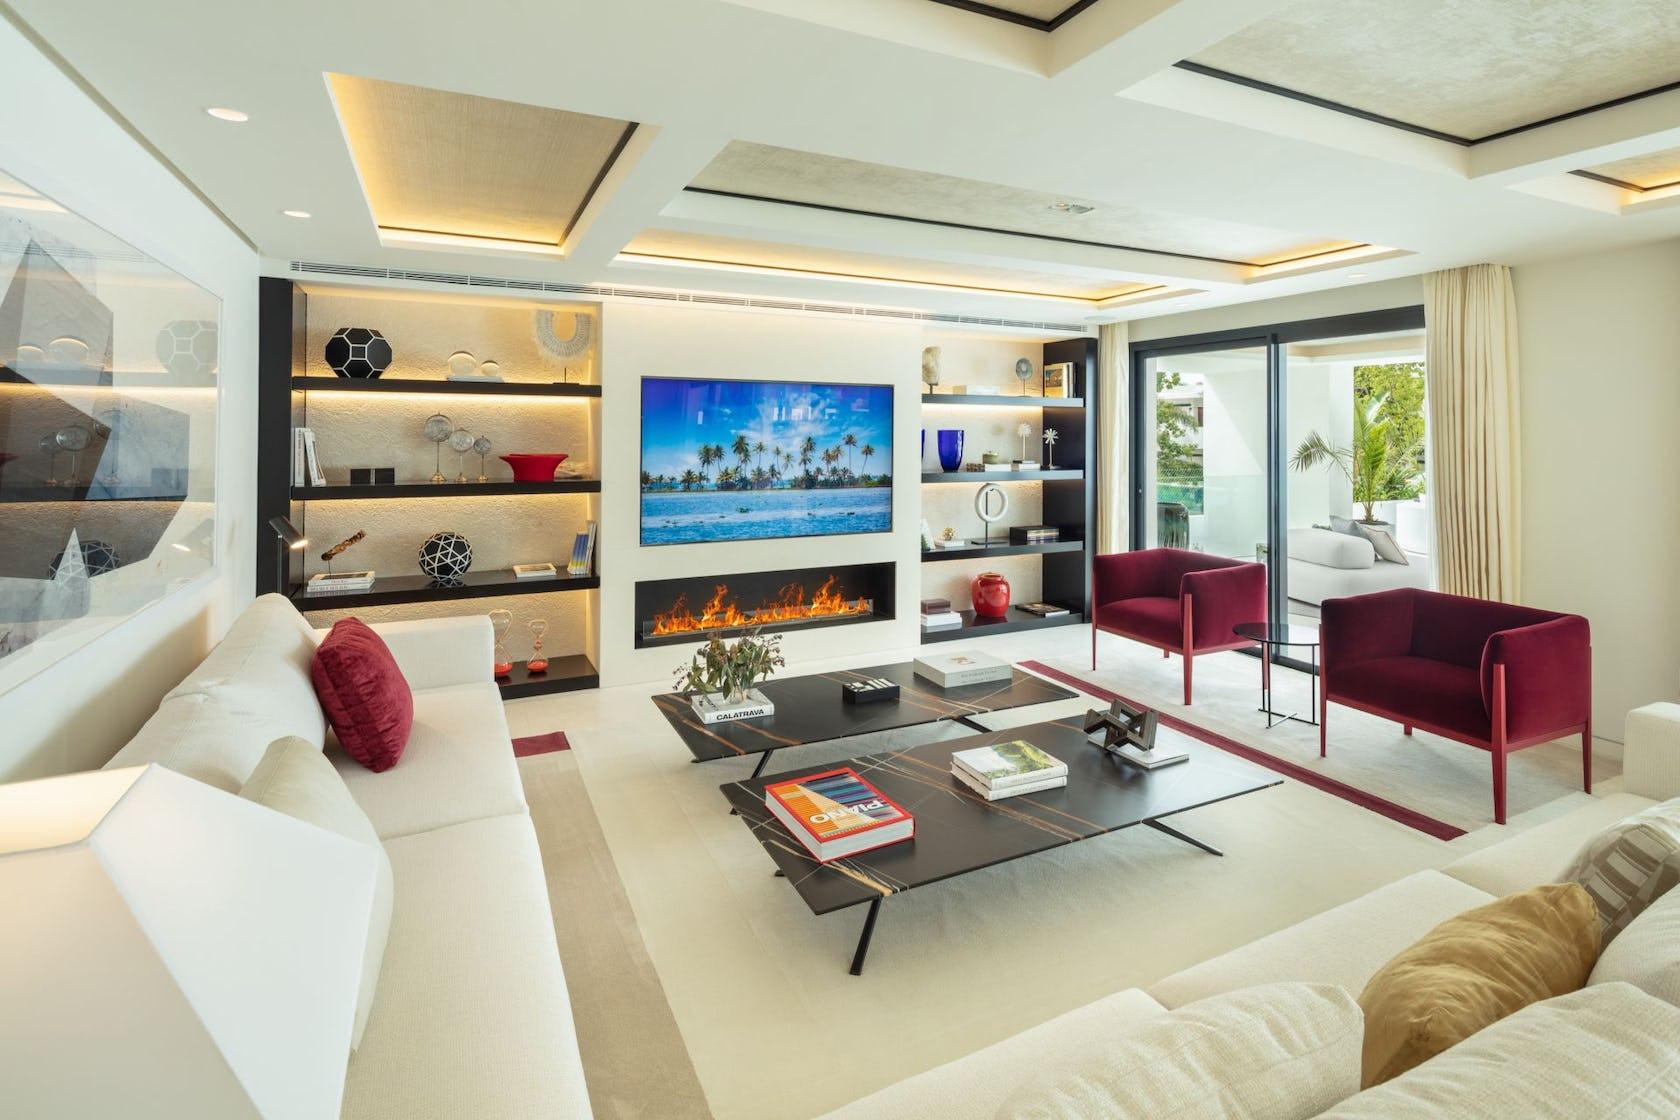 furniture table living room indoors room interior design coffee table rug